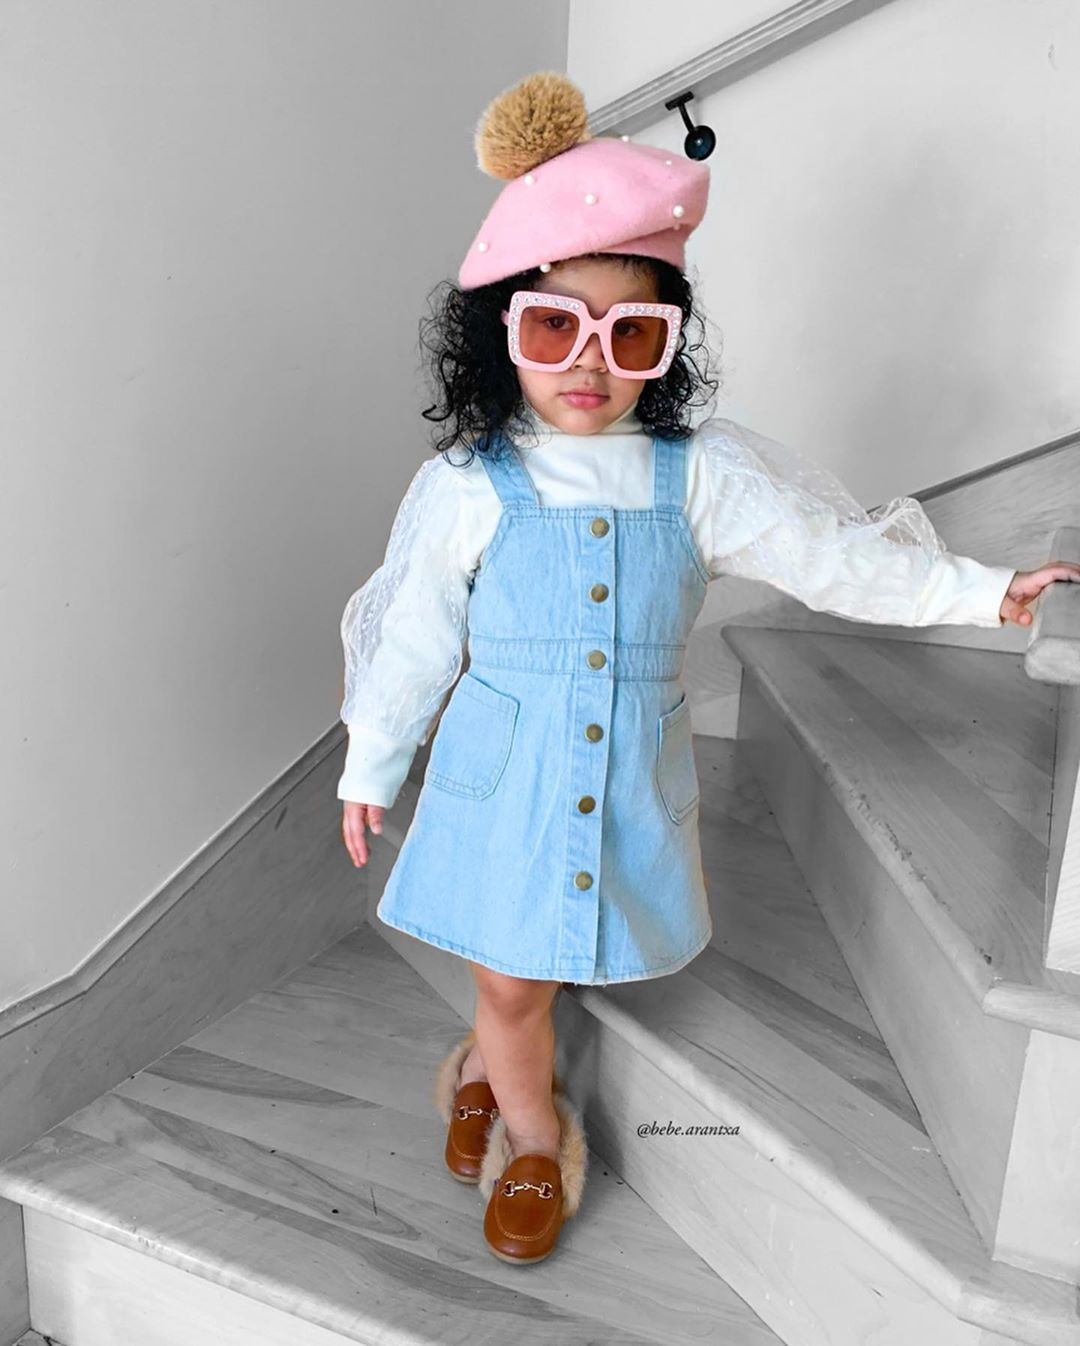 "Arantxa Sanchez on Instagram: ""Have a wonderful day!! 🌸🌸🌸 • • Outfit : @aluxurystore1 • •  #minifashionkidz #trendykids #trendy #ig_fashionkiddies #top_minifashionistas…"""